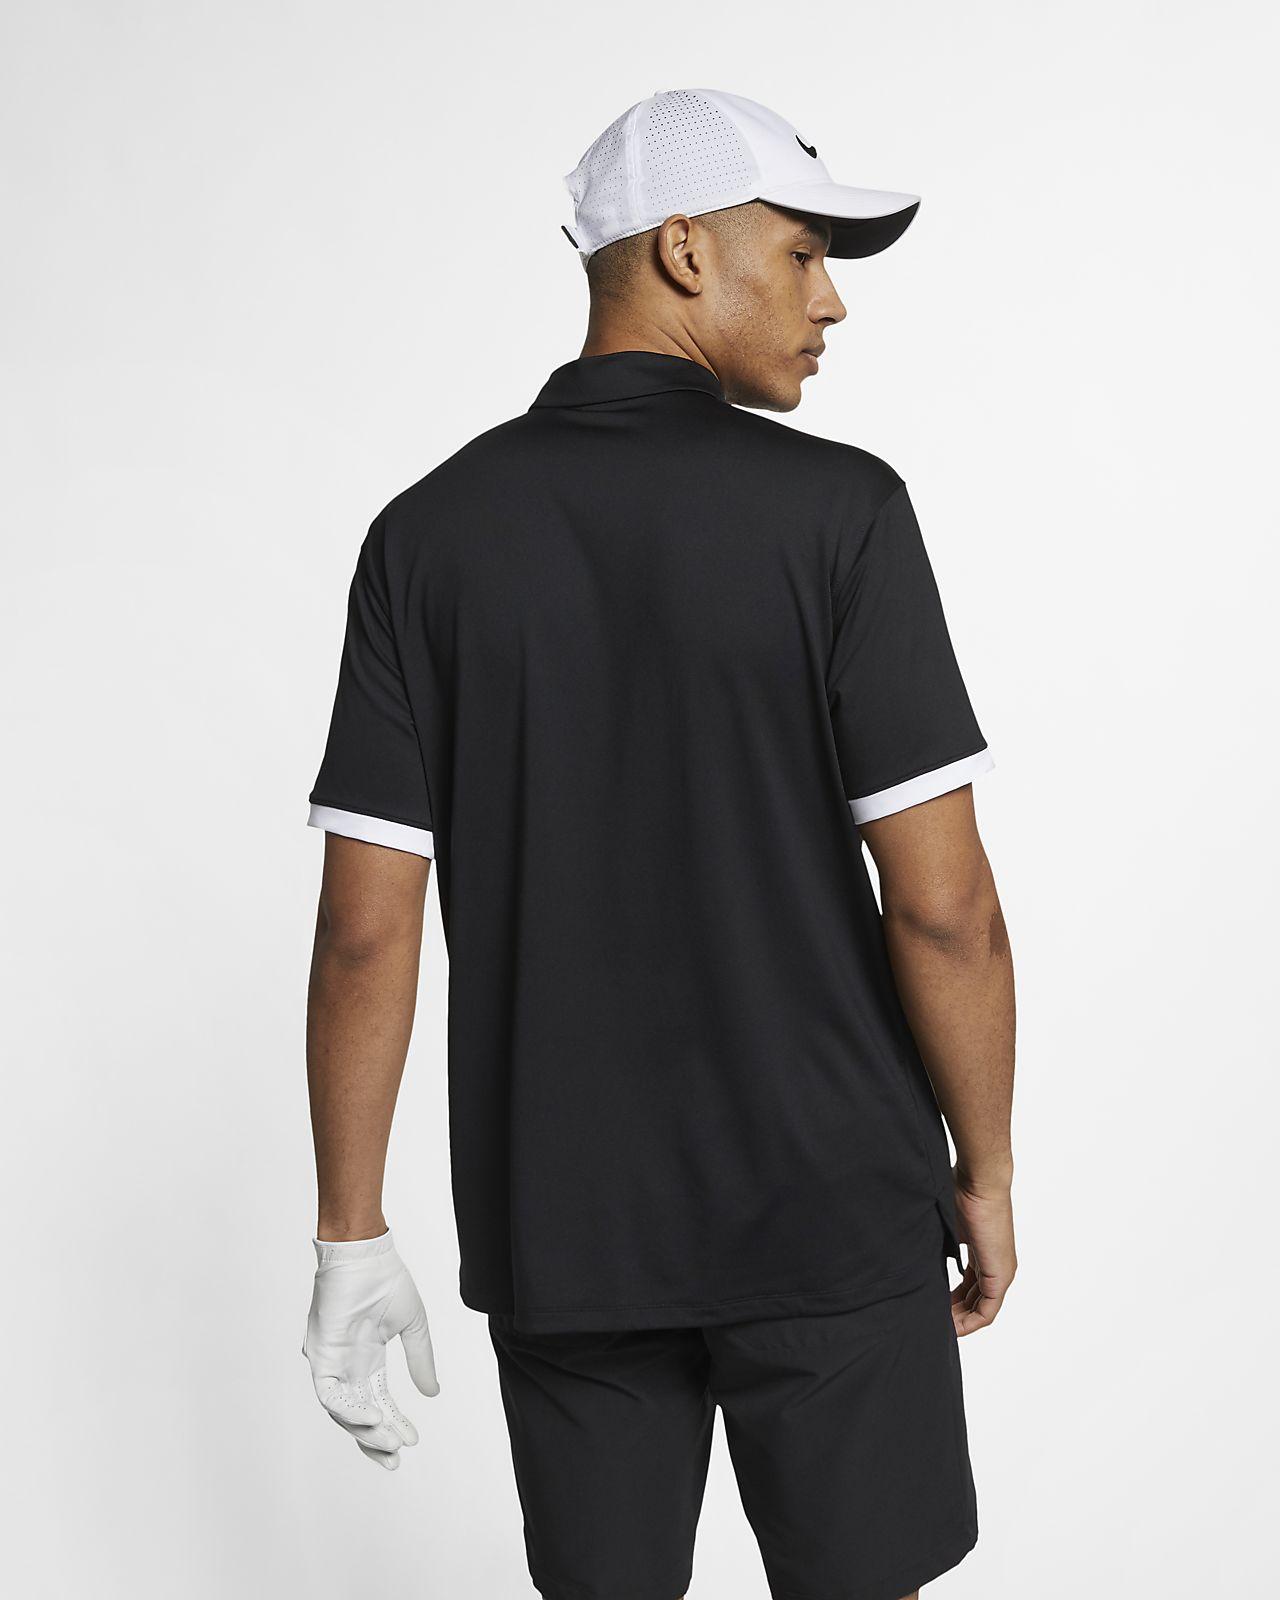 49996f9b4 Nike Dri-FIT Vapor Men's Golf Polo